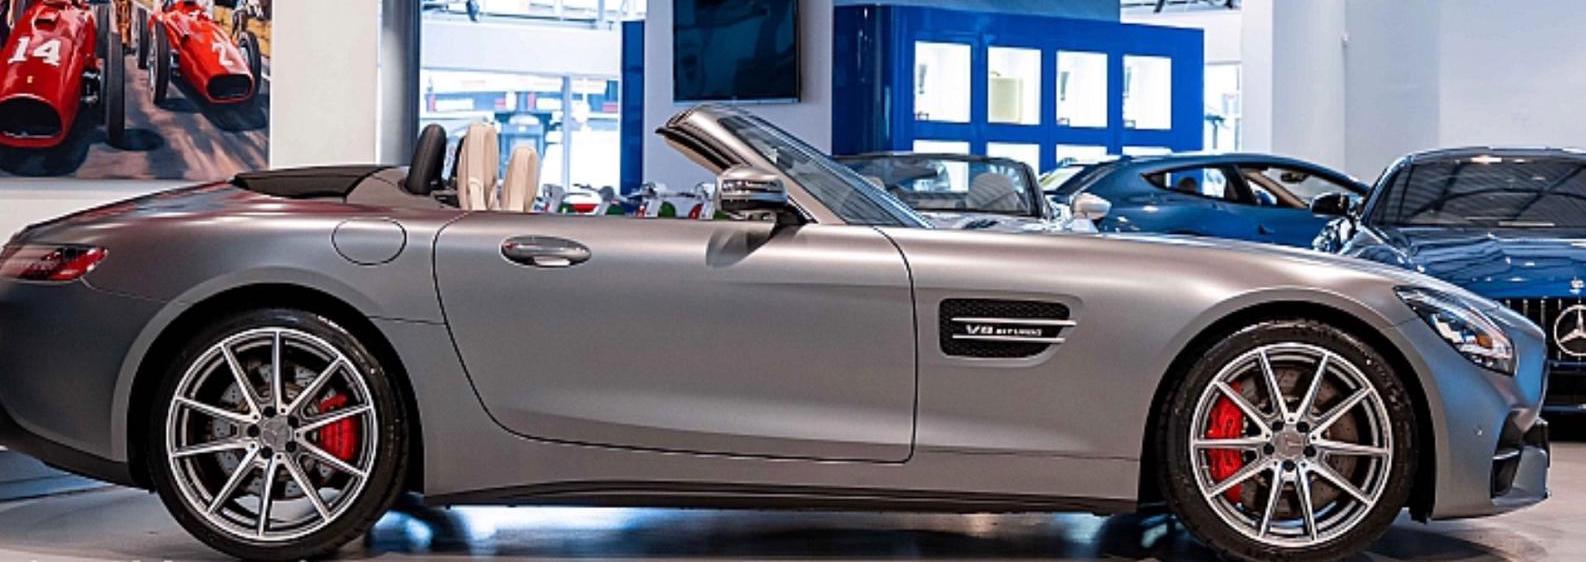 AMG GTS side view